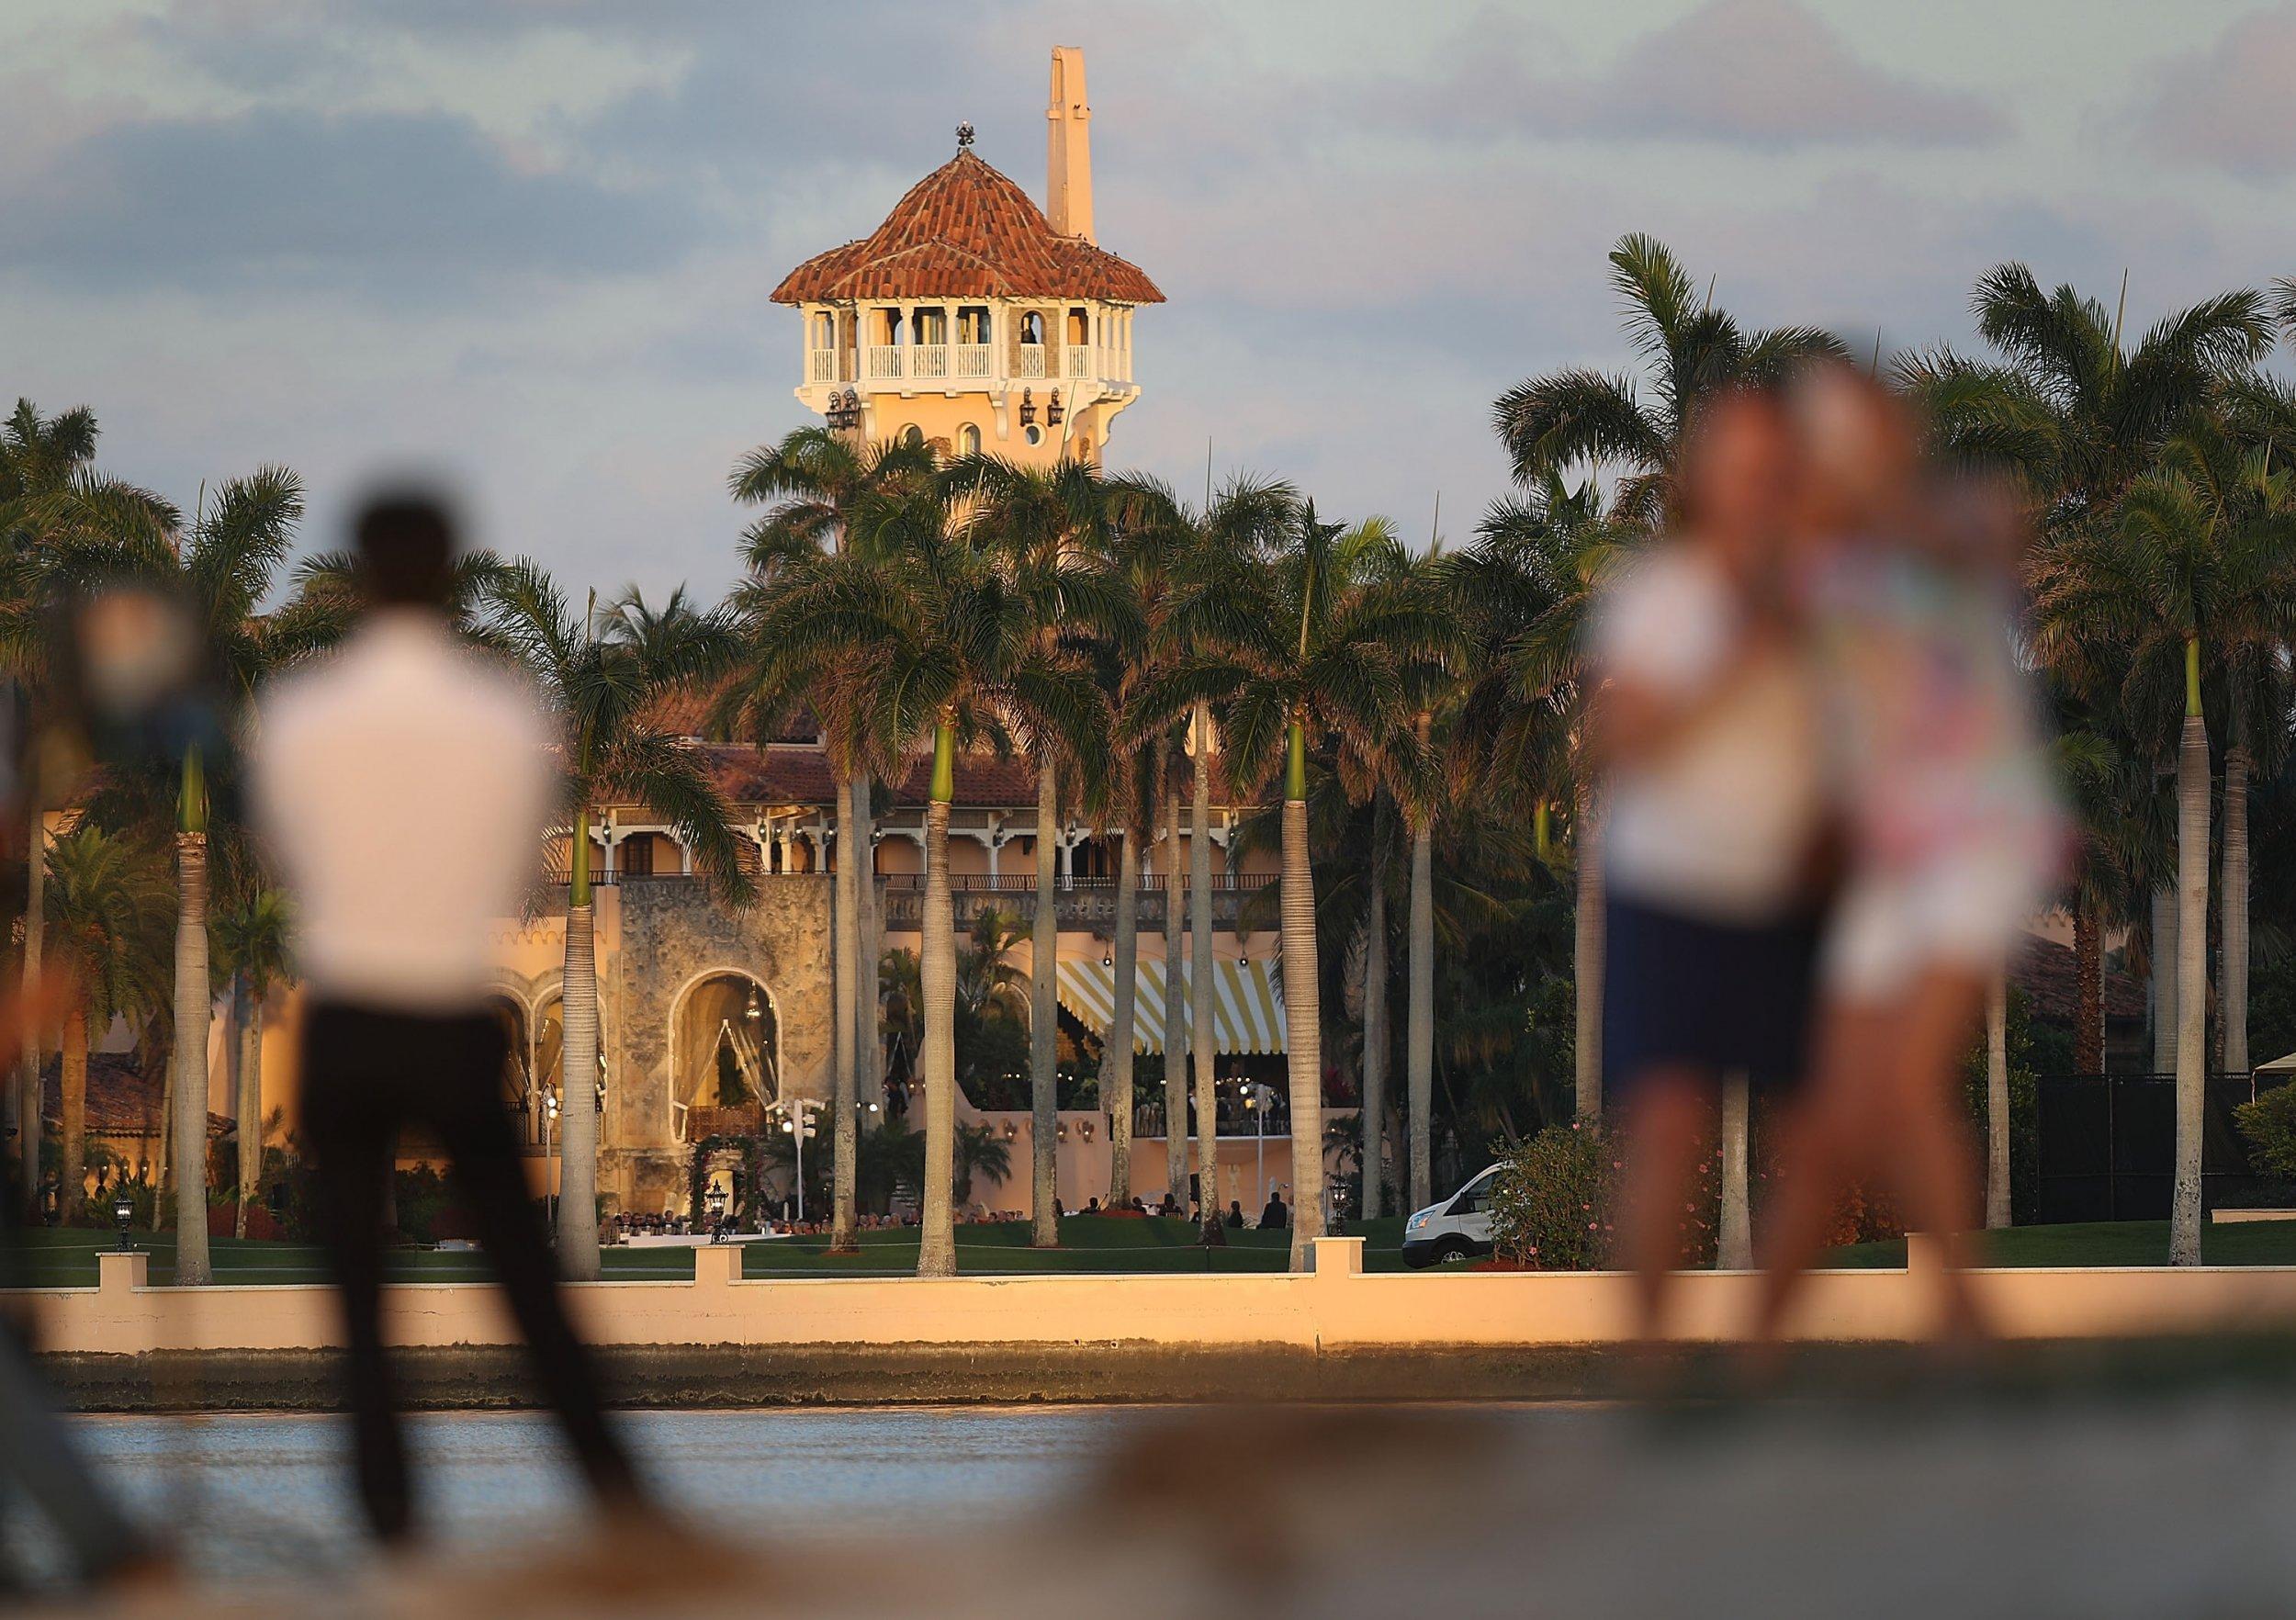 mar-a-lago lawsuit trump resort employee sexual harassment reporting